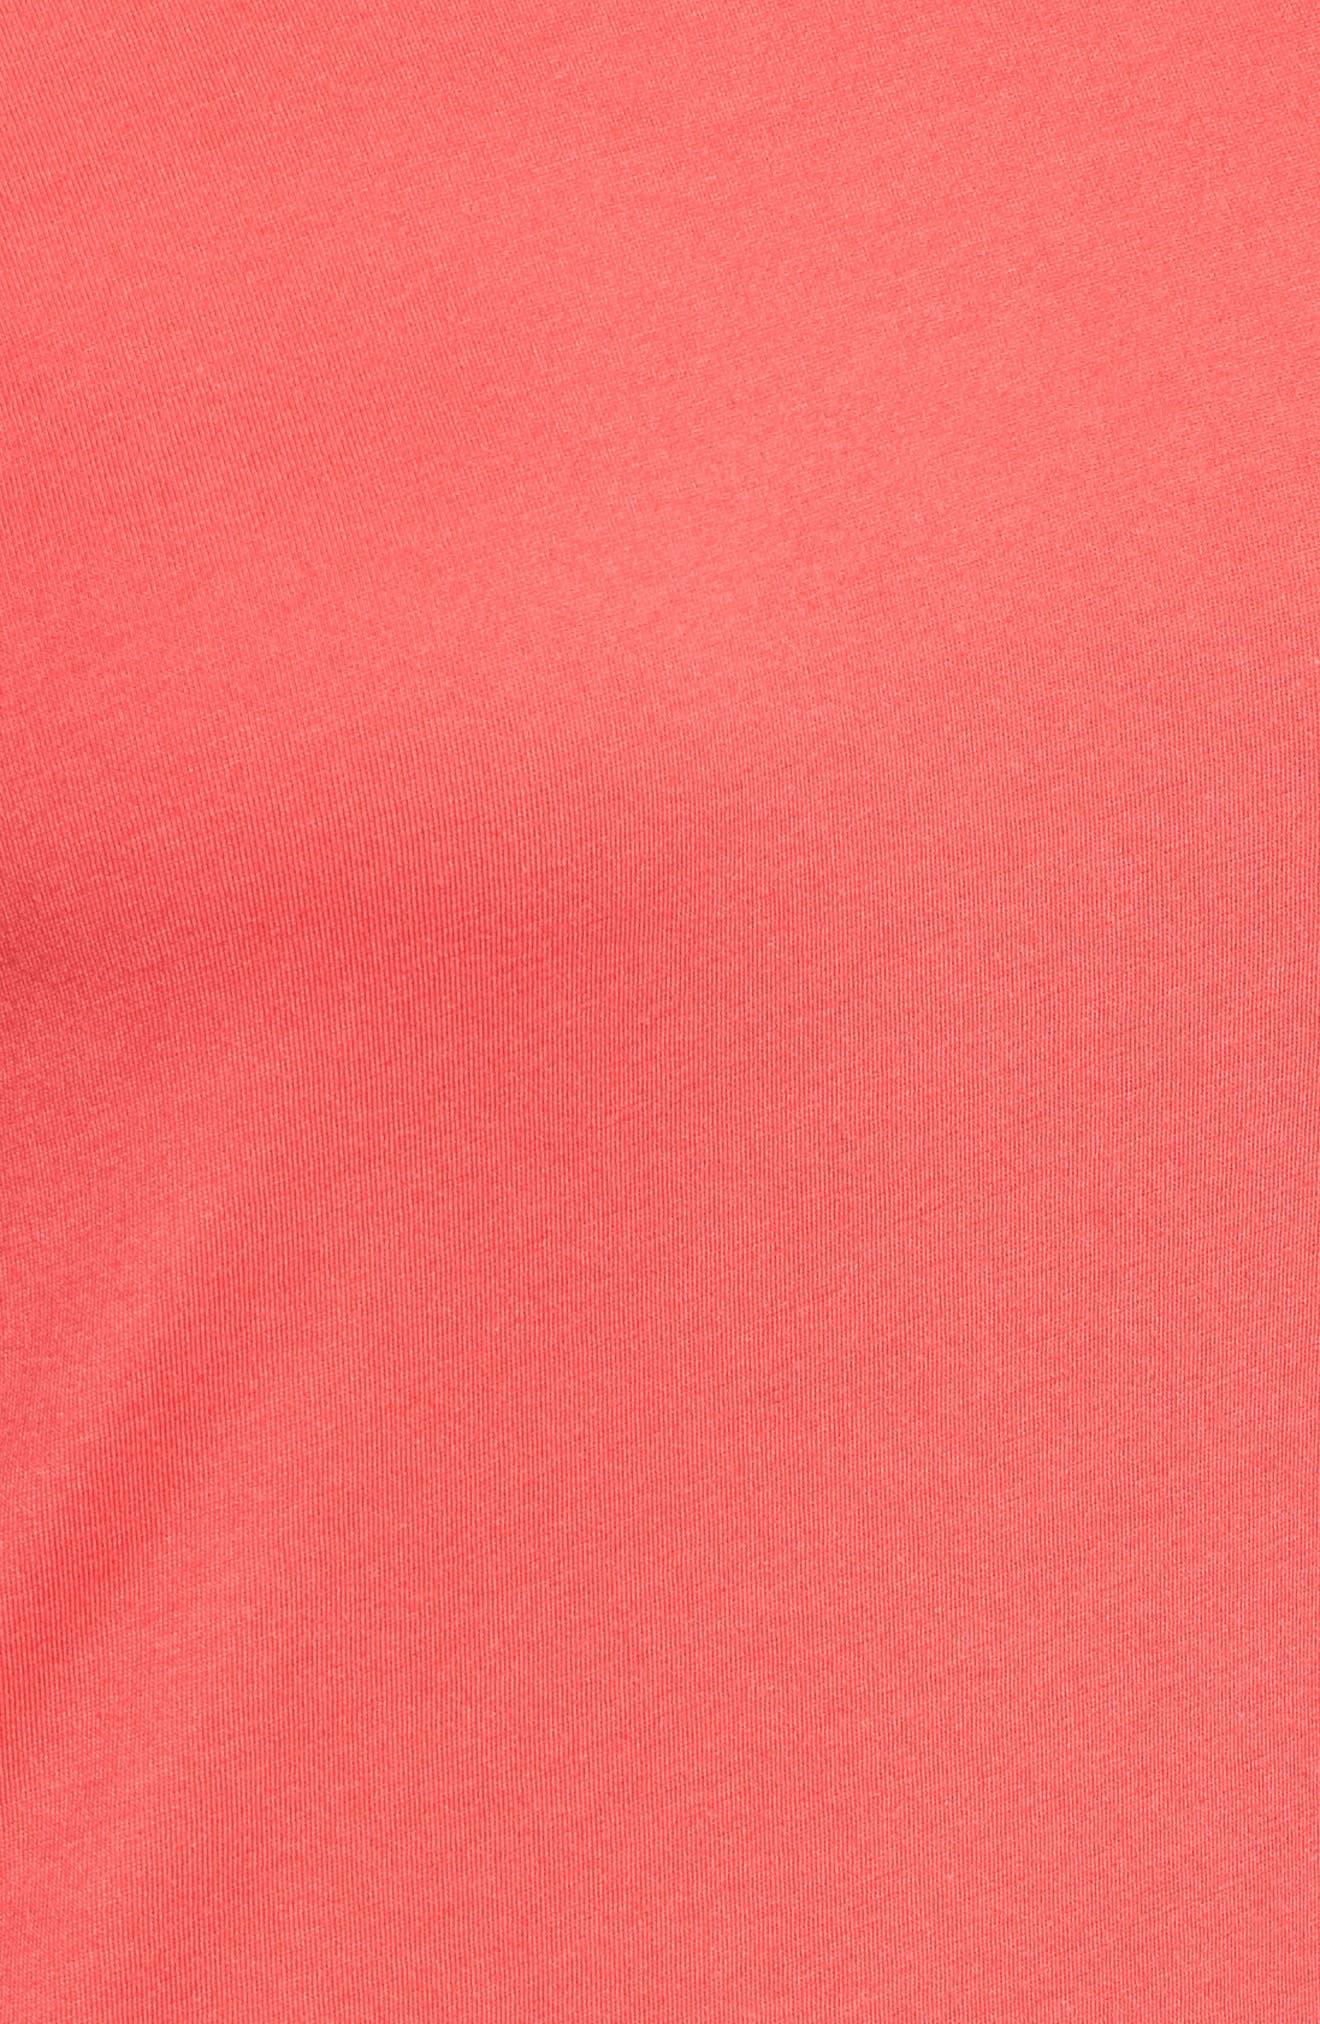 Short Sleeve Crewneck Tee,                             Alternate thumbnail 98, color,